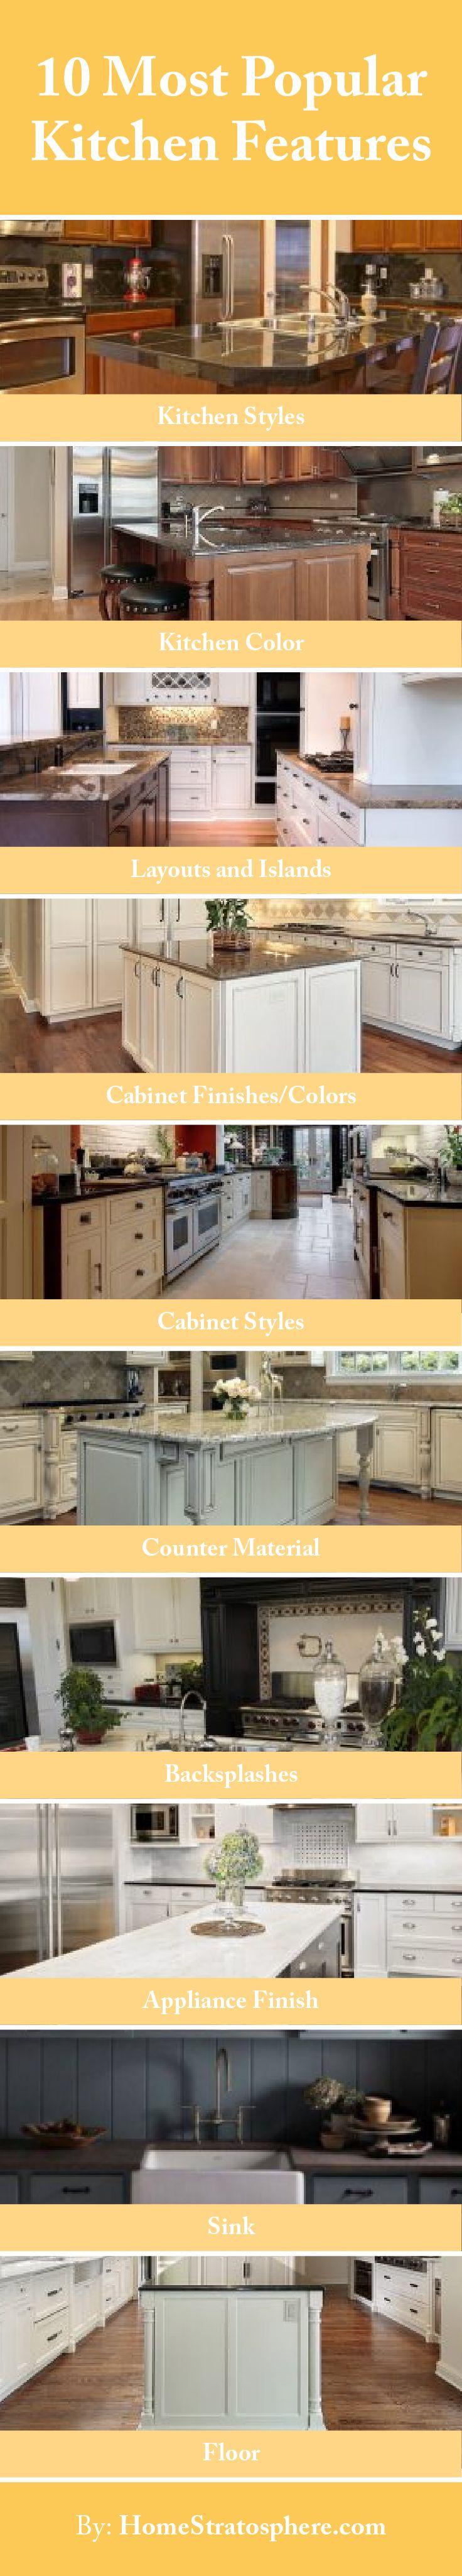 3644 best kitchen ideas images on pinterest kitchen for Popular kitchen layouts